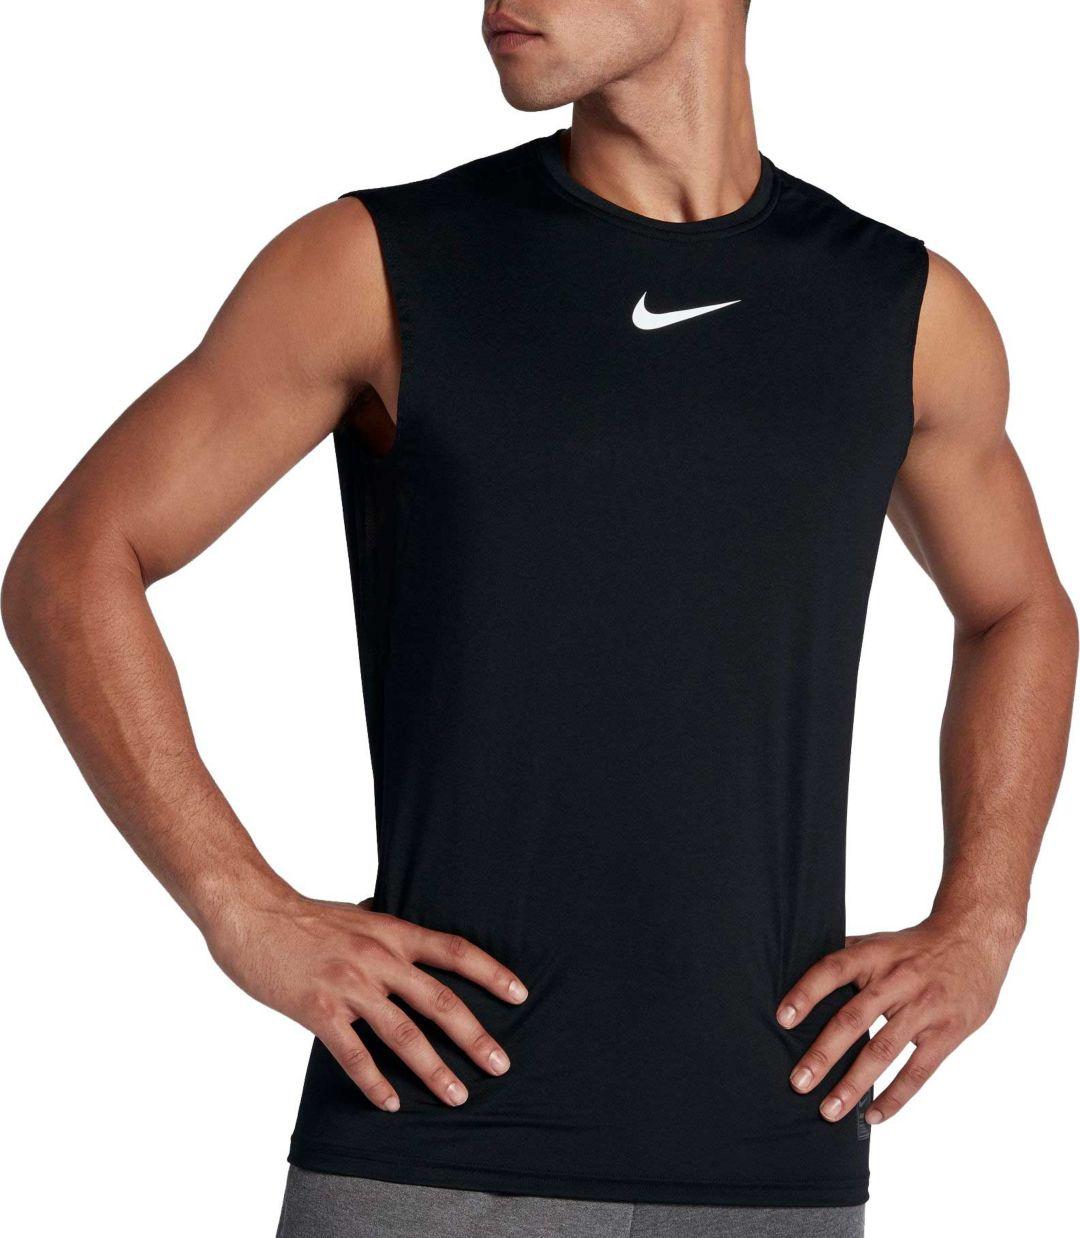 Shirt Sleeveless Fitted Nike Pro Men's dCBxoe